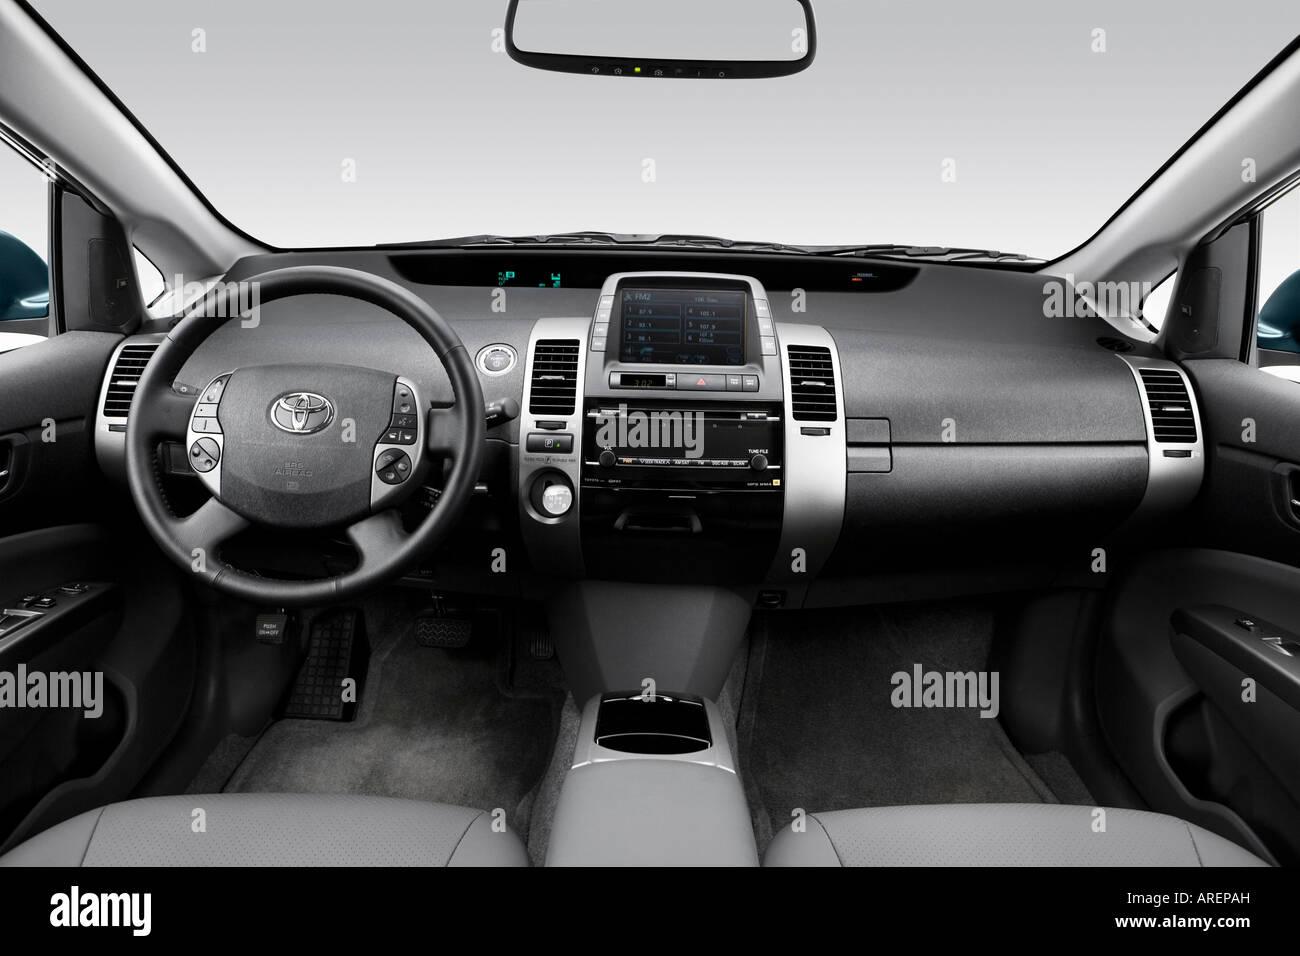 2006 Toyota Prius Hybrid in Blue - Dashboard, center console, gear ...